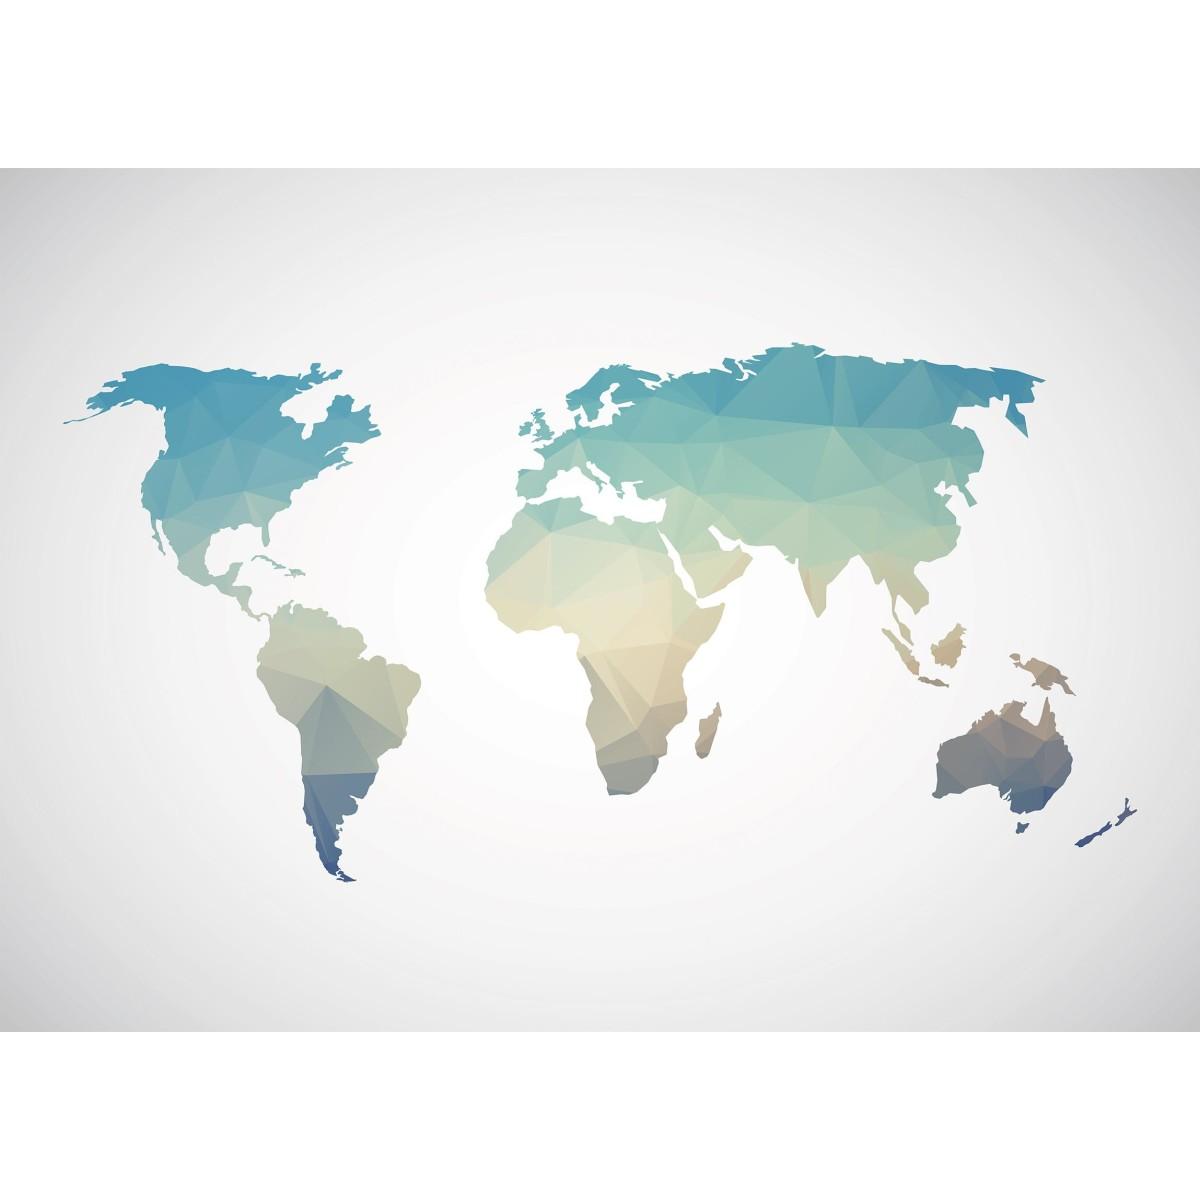 Фотообои WonderWall Градиентная карта 173 280х389см